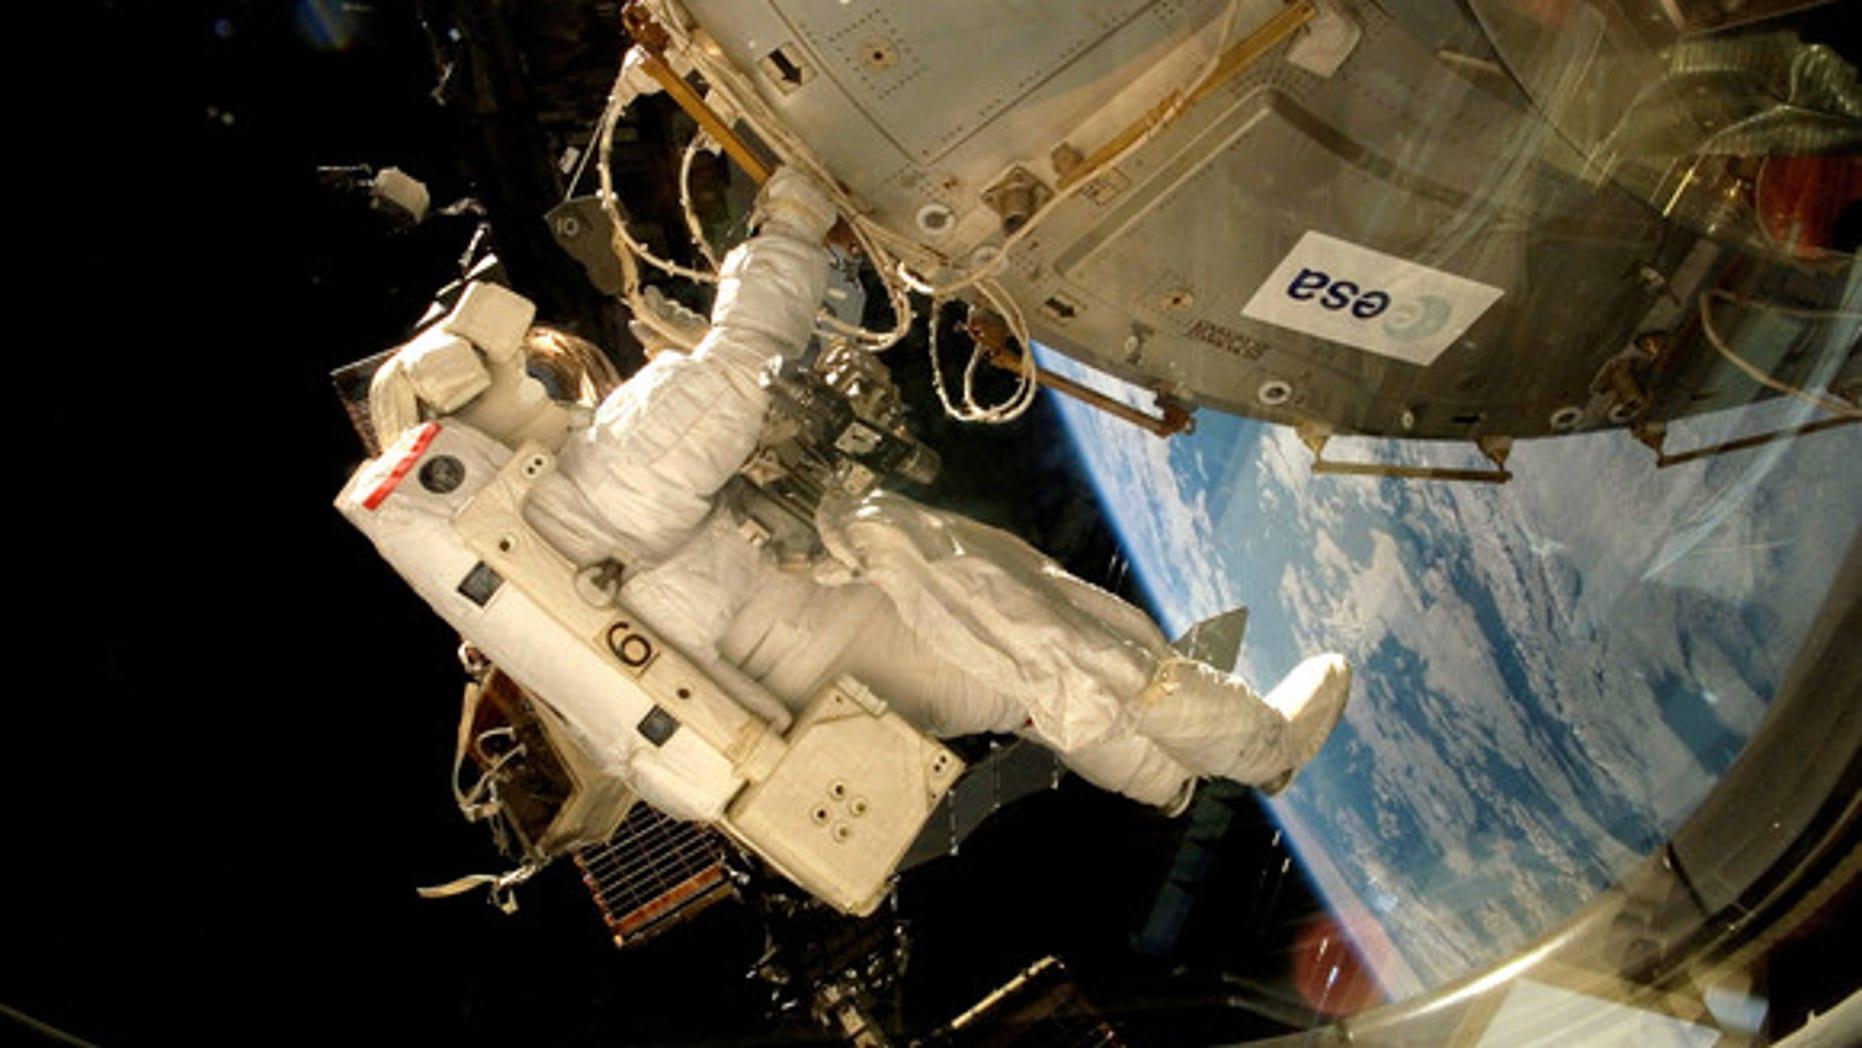 An astronaut fixes the EXPOSE-E platform onto the International Space Station. (ESA)